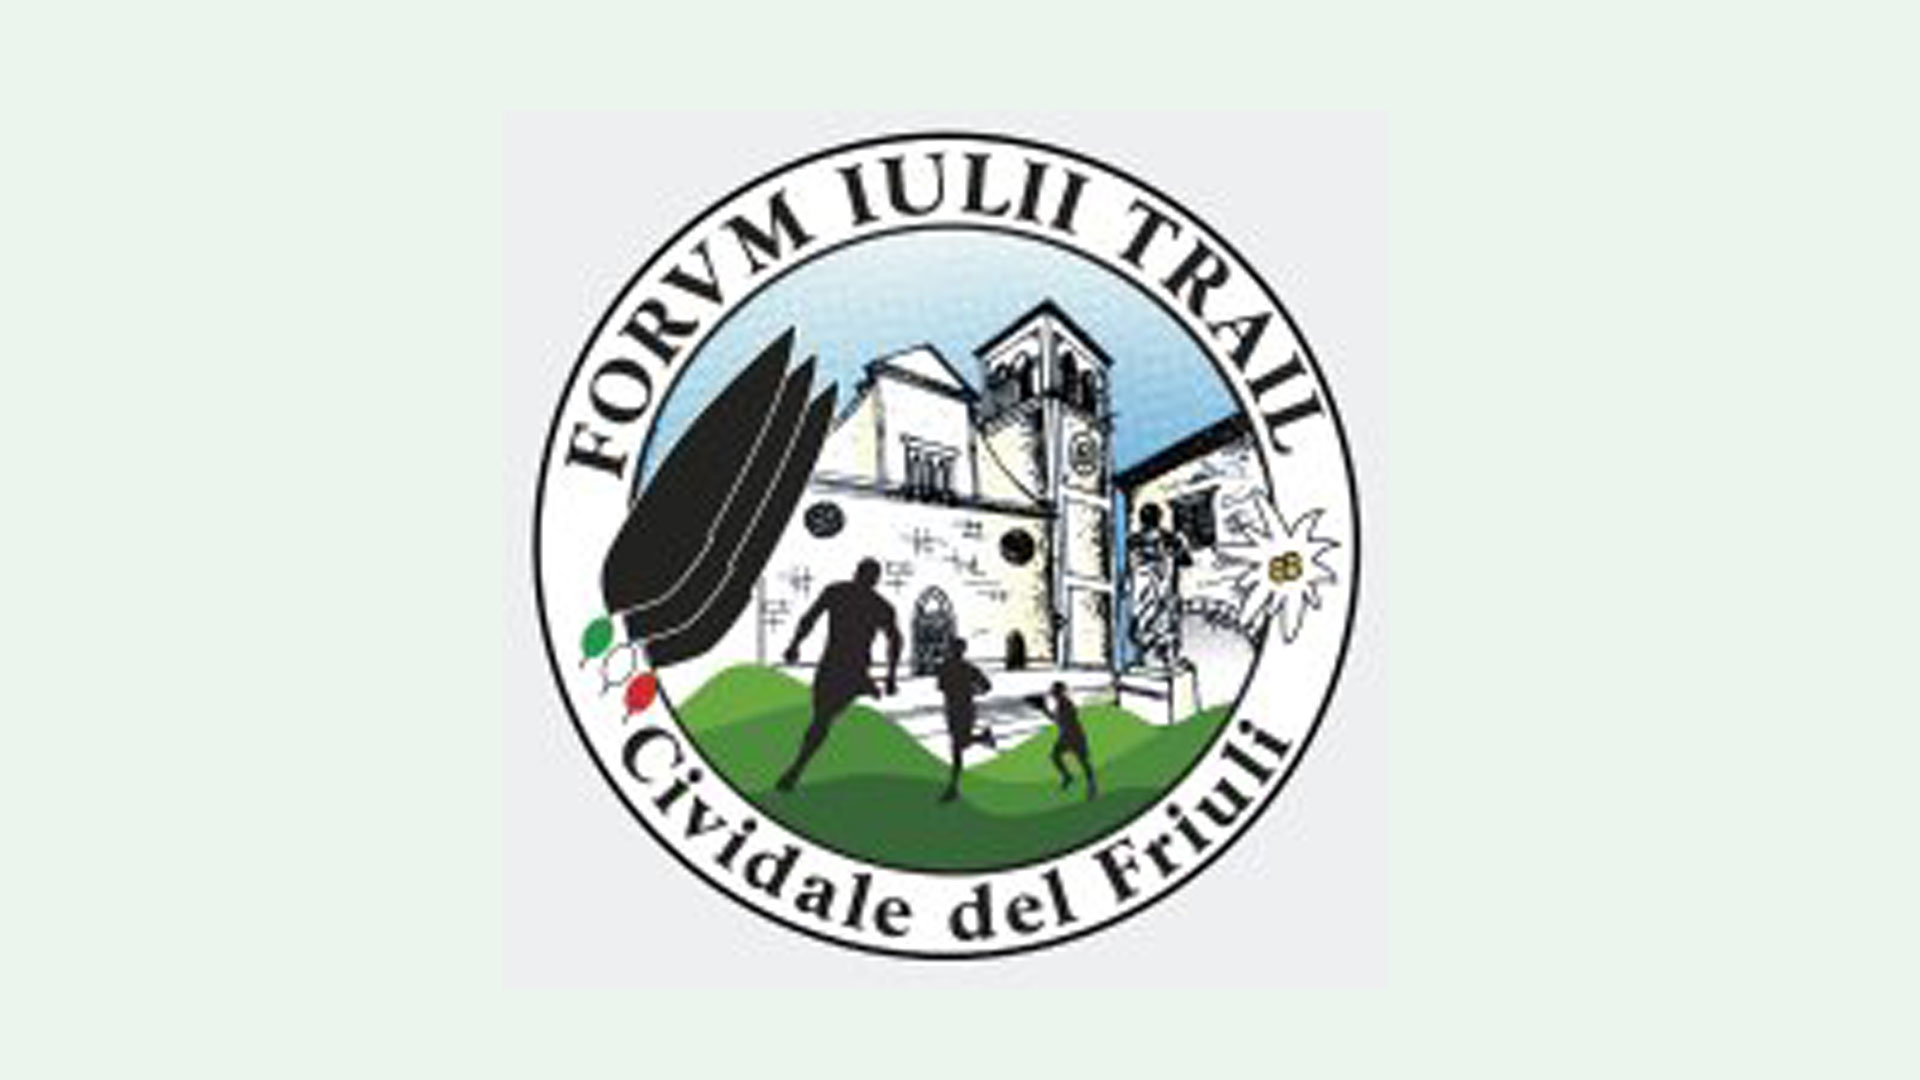 FVG Trail Running Tour 2018: Forum Iulii Trail